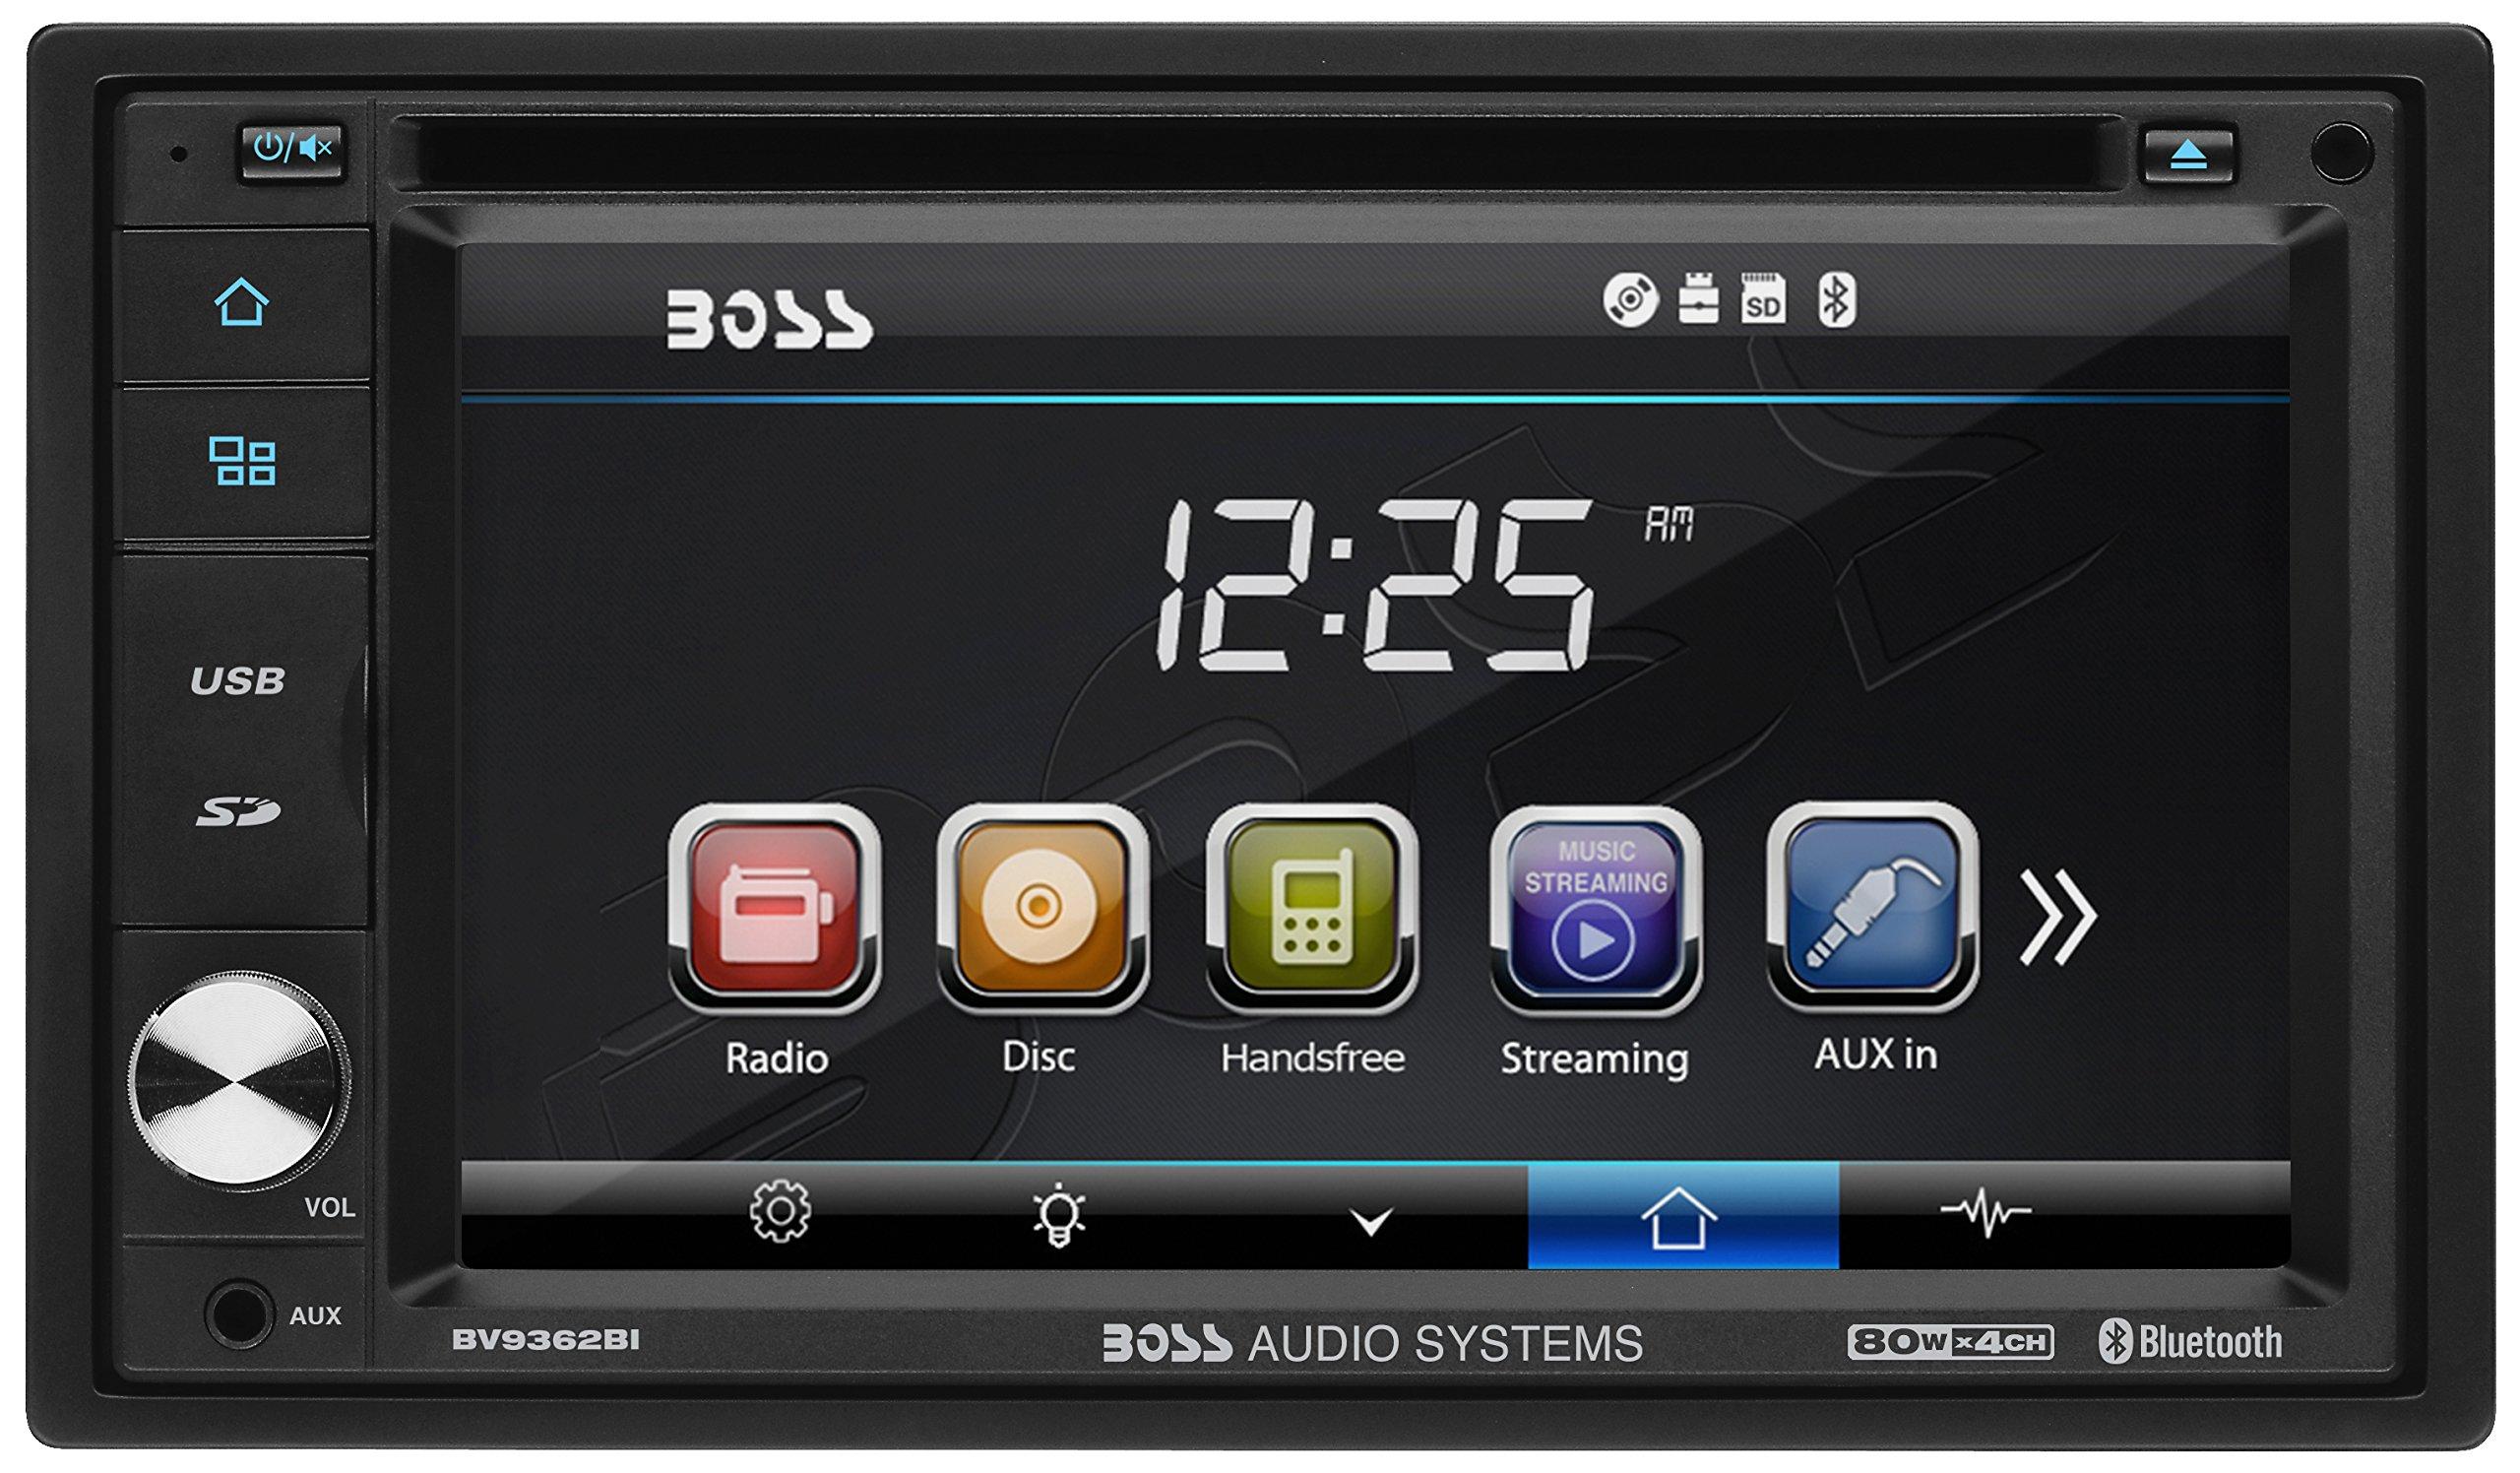 Car Stereo | BOSS Audio BV9362BI Double Din, 6.2 Inch Digital LCD Monitor, Touchscreen, DVD/CD/MP3/USB/SD AM/FM, Bluetooth, Wireless Remote